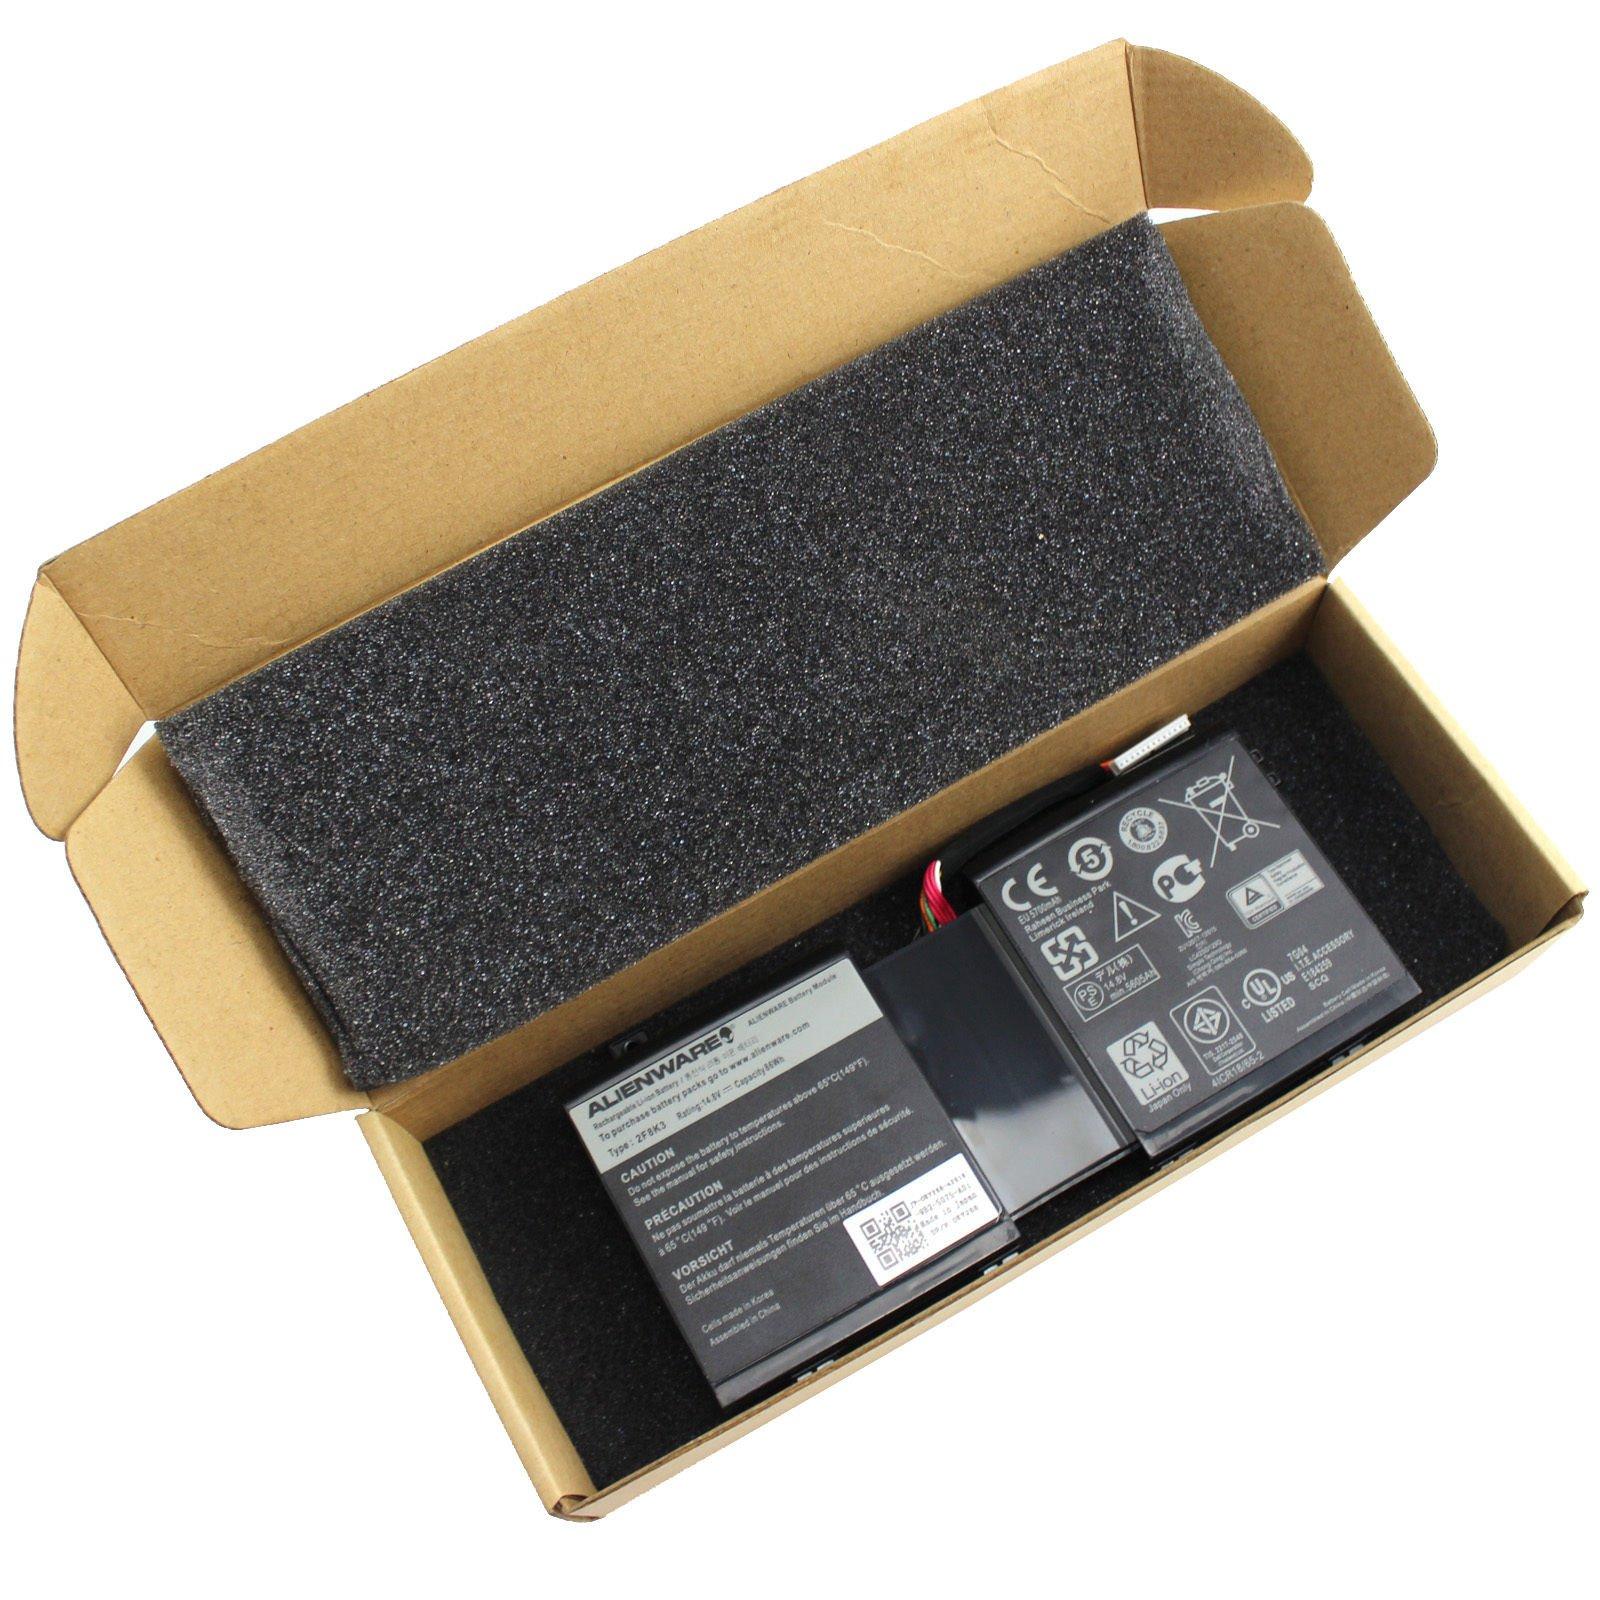 Laptop Battery Dell Alienware M17X R5/M18X R3 0G33TT 2F8K30KJ2PX 86WH by ABM